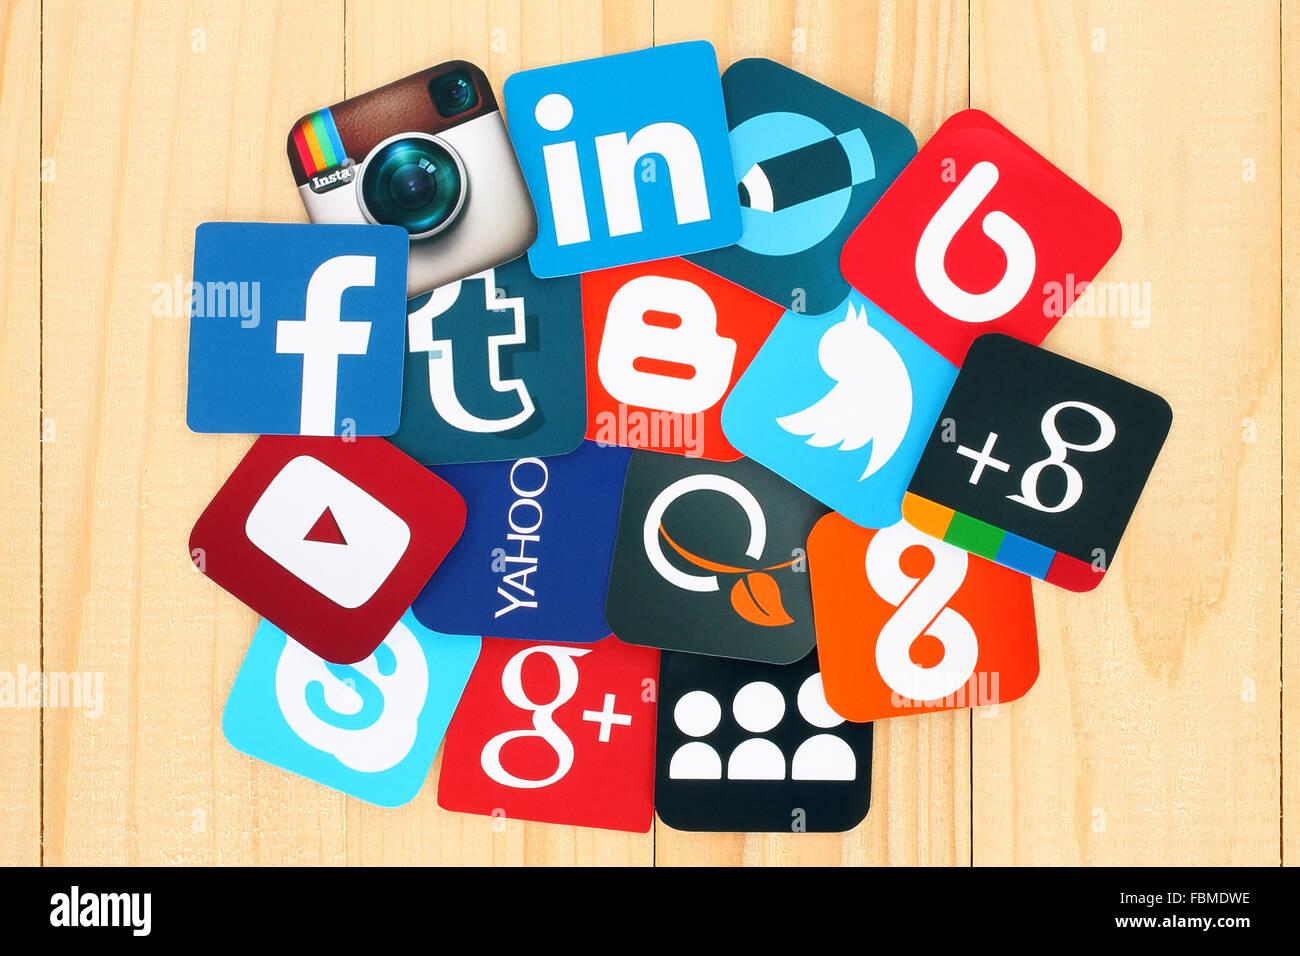 Kiev, Ukraine - July 01, 2015: Famous social media icons such as: Facebook, Twitter, Blogger, Linkedin, Tumblr, - Stock Image